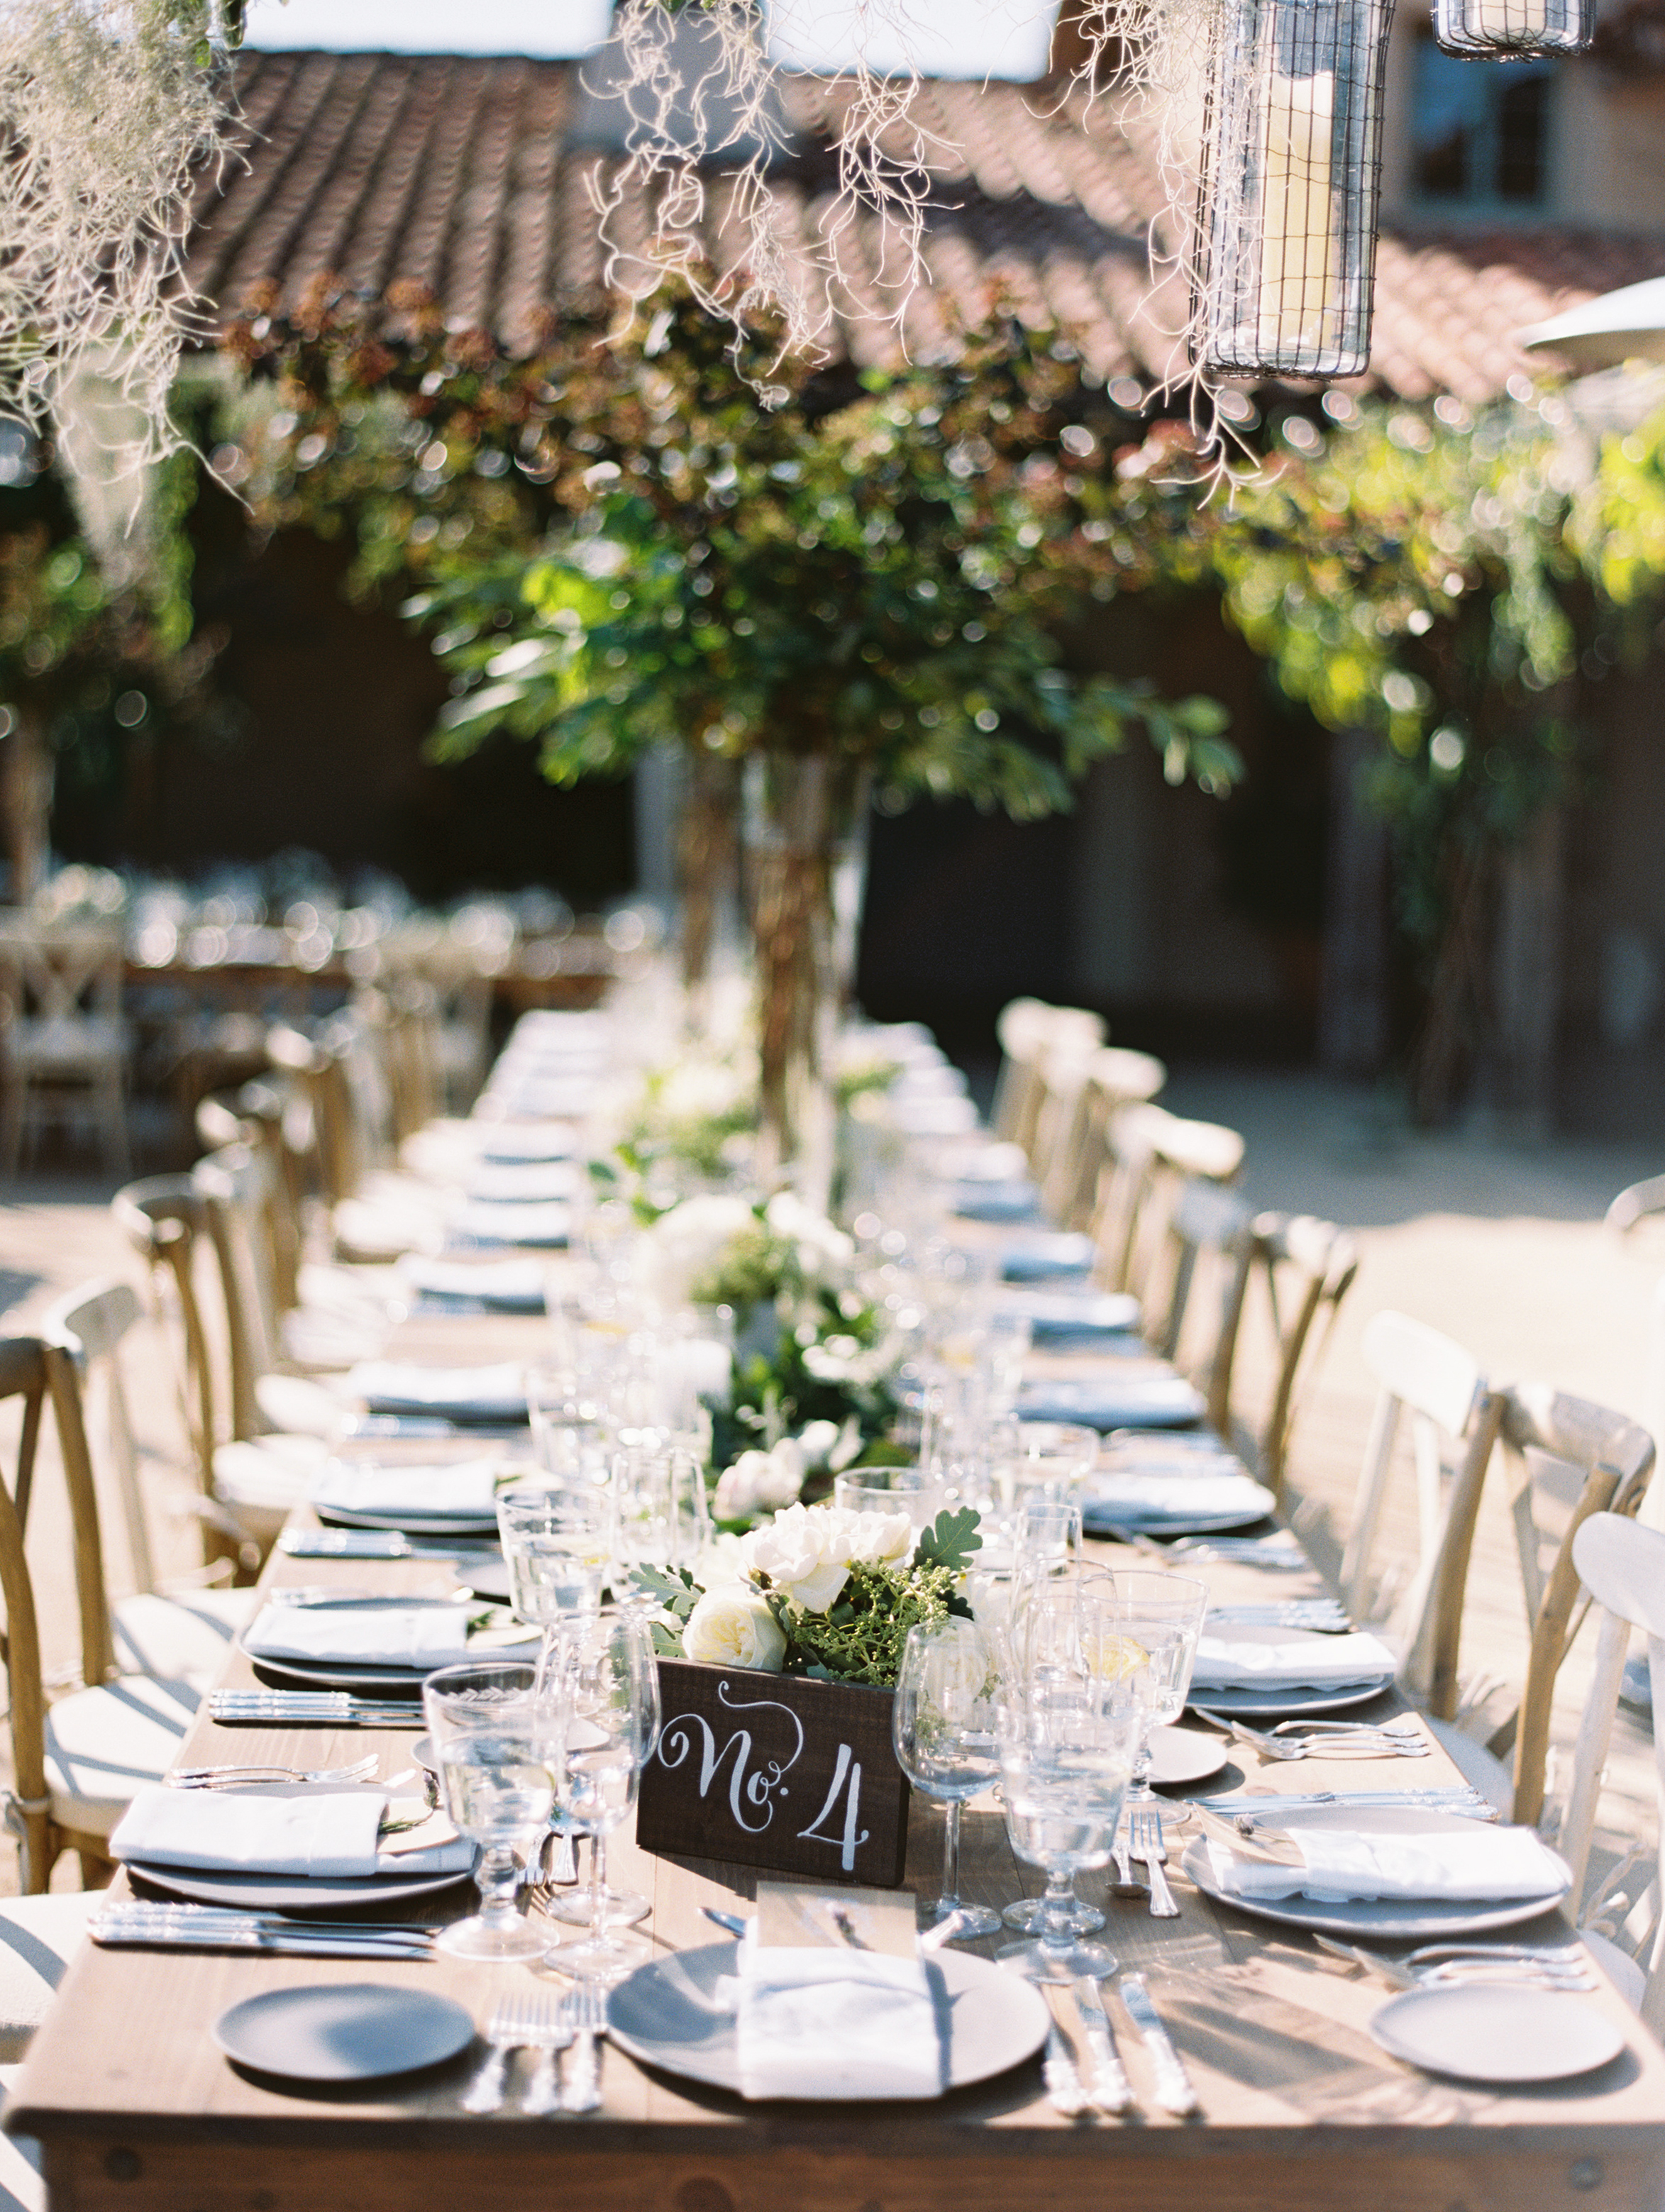 www.santabarbarawedding.com | Pat Moyer Wedding Photography & Films | Santa Barbara Historical Museum | Magnolia Weddings | Camiella Floral Designs | Reception